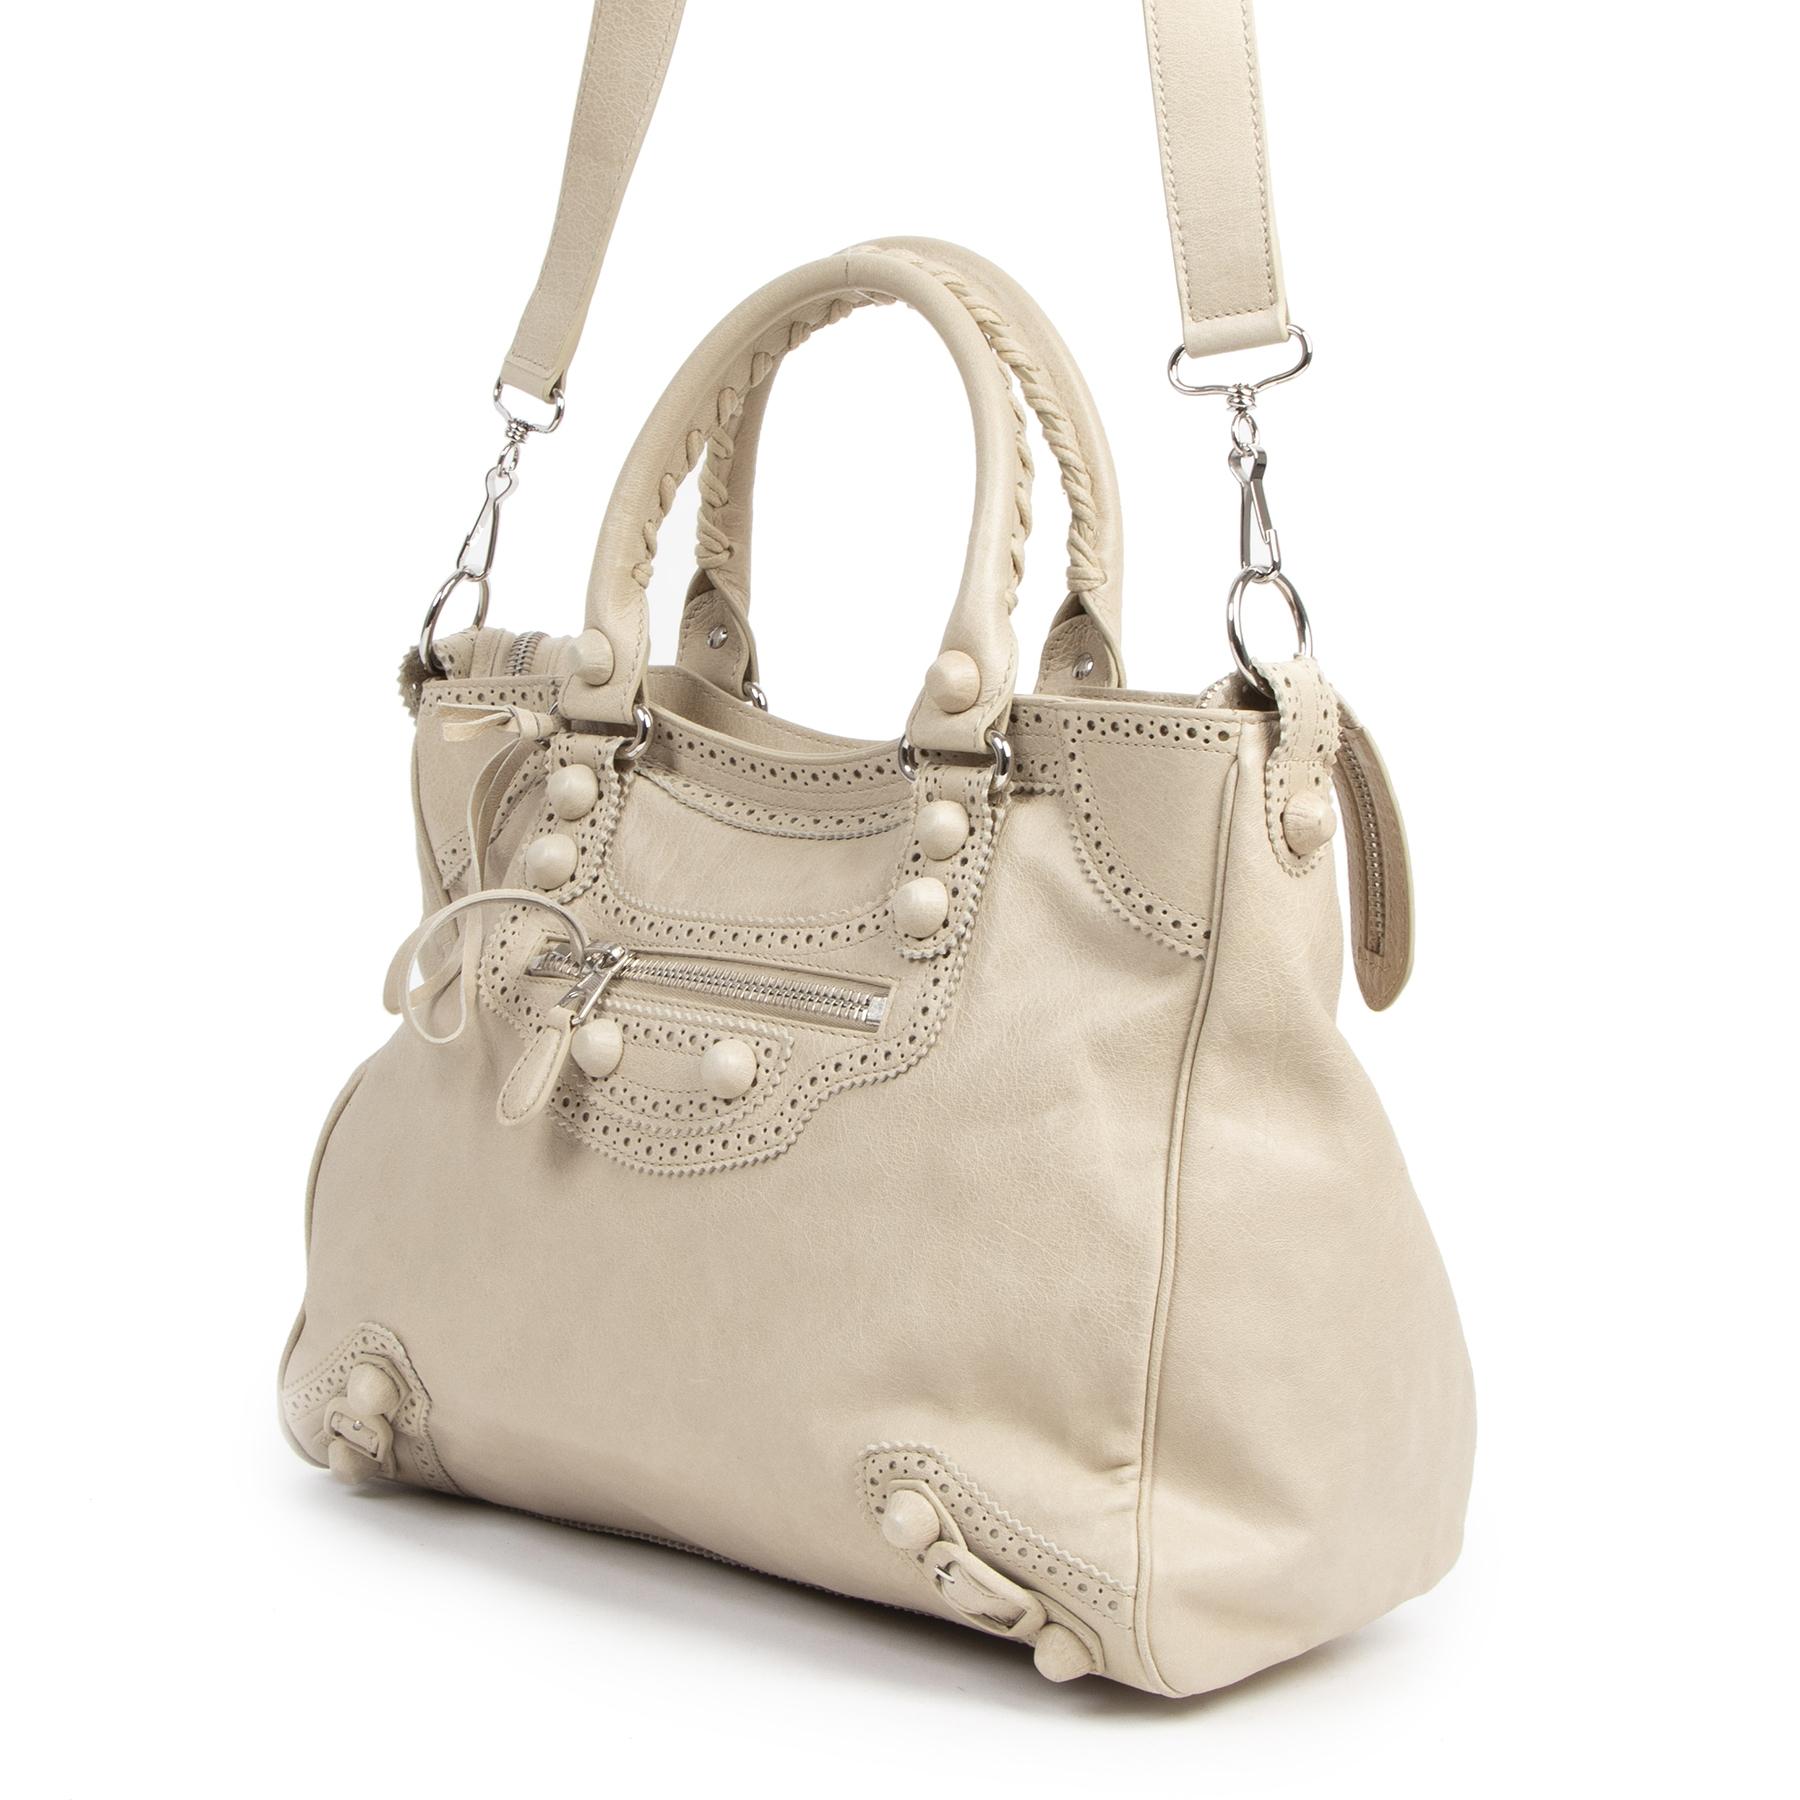 Authentic secondhand Balenciaga Velo Brogue Cream Leather Handbag designer bags fashion luxury vintage webshop safe secure online shopping designer high end brands